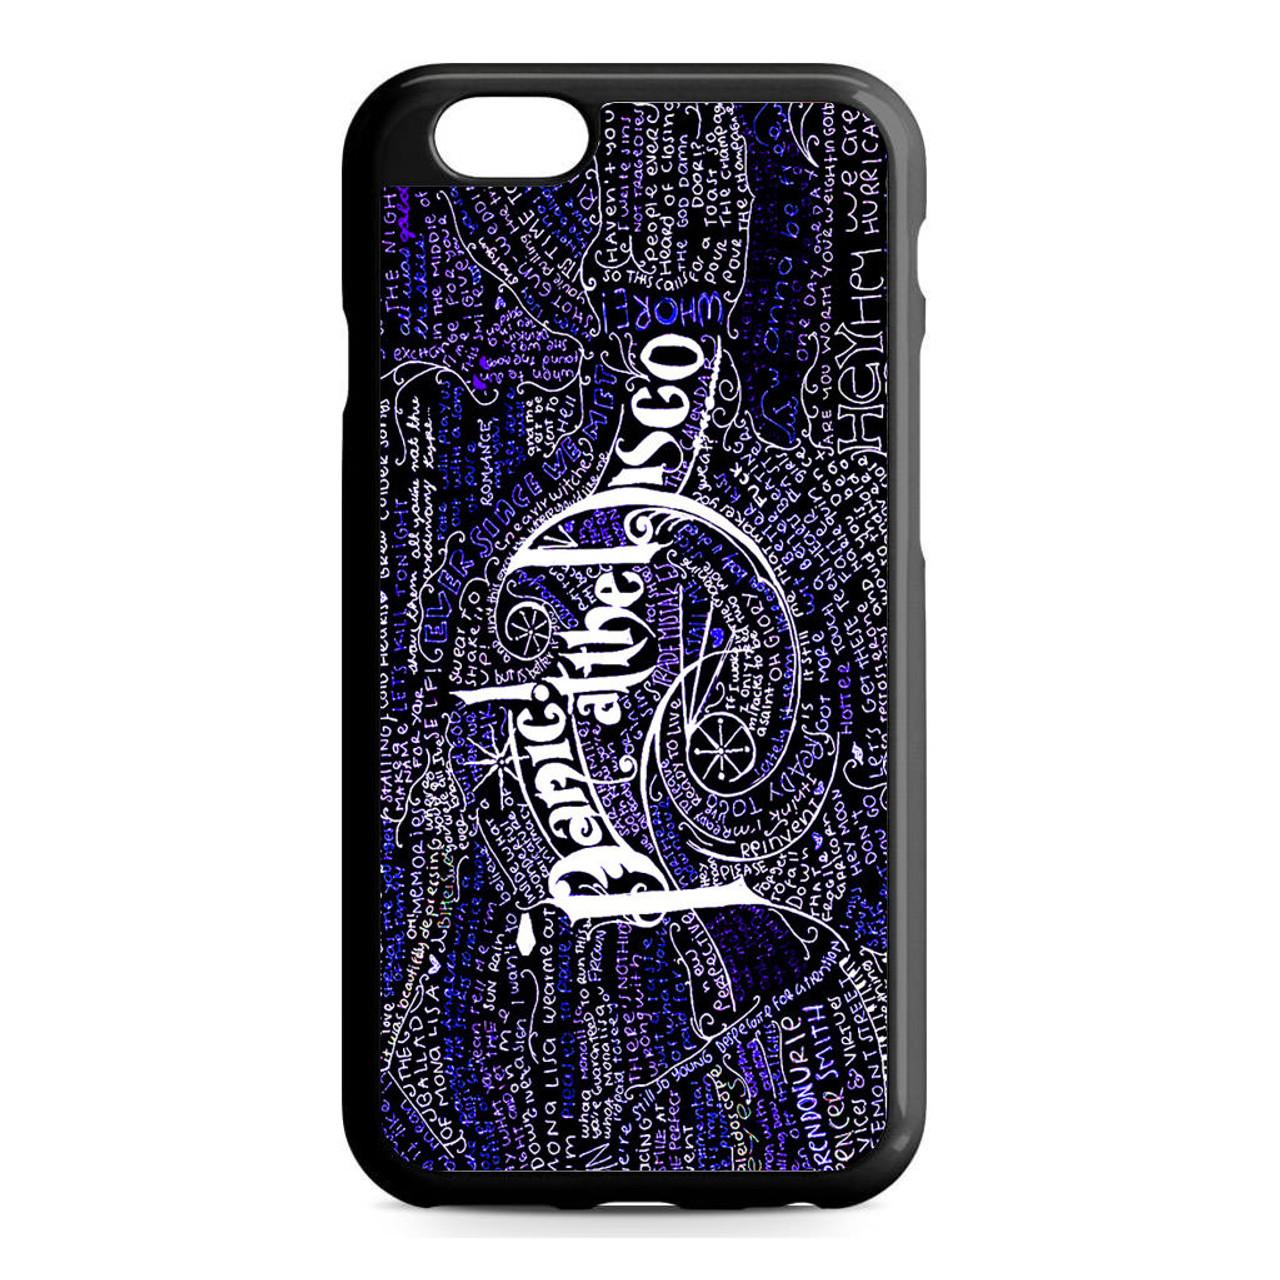 iphone 6s case patd